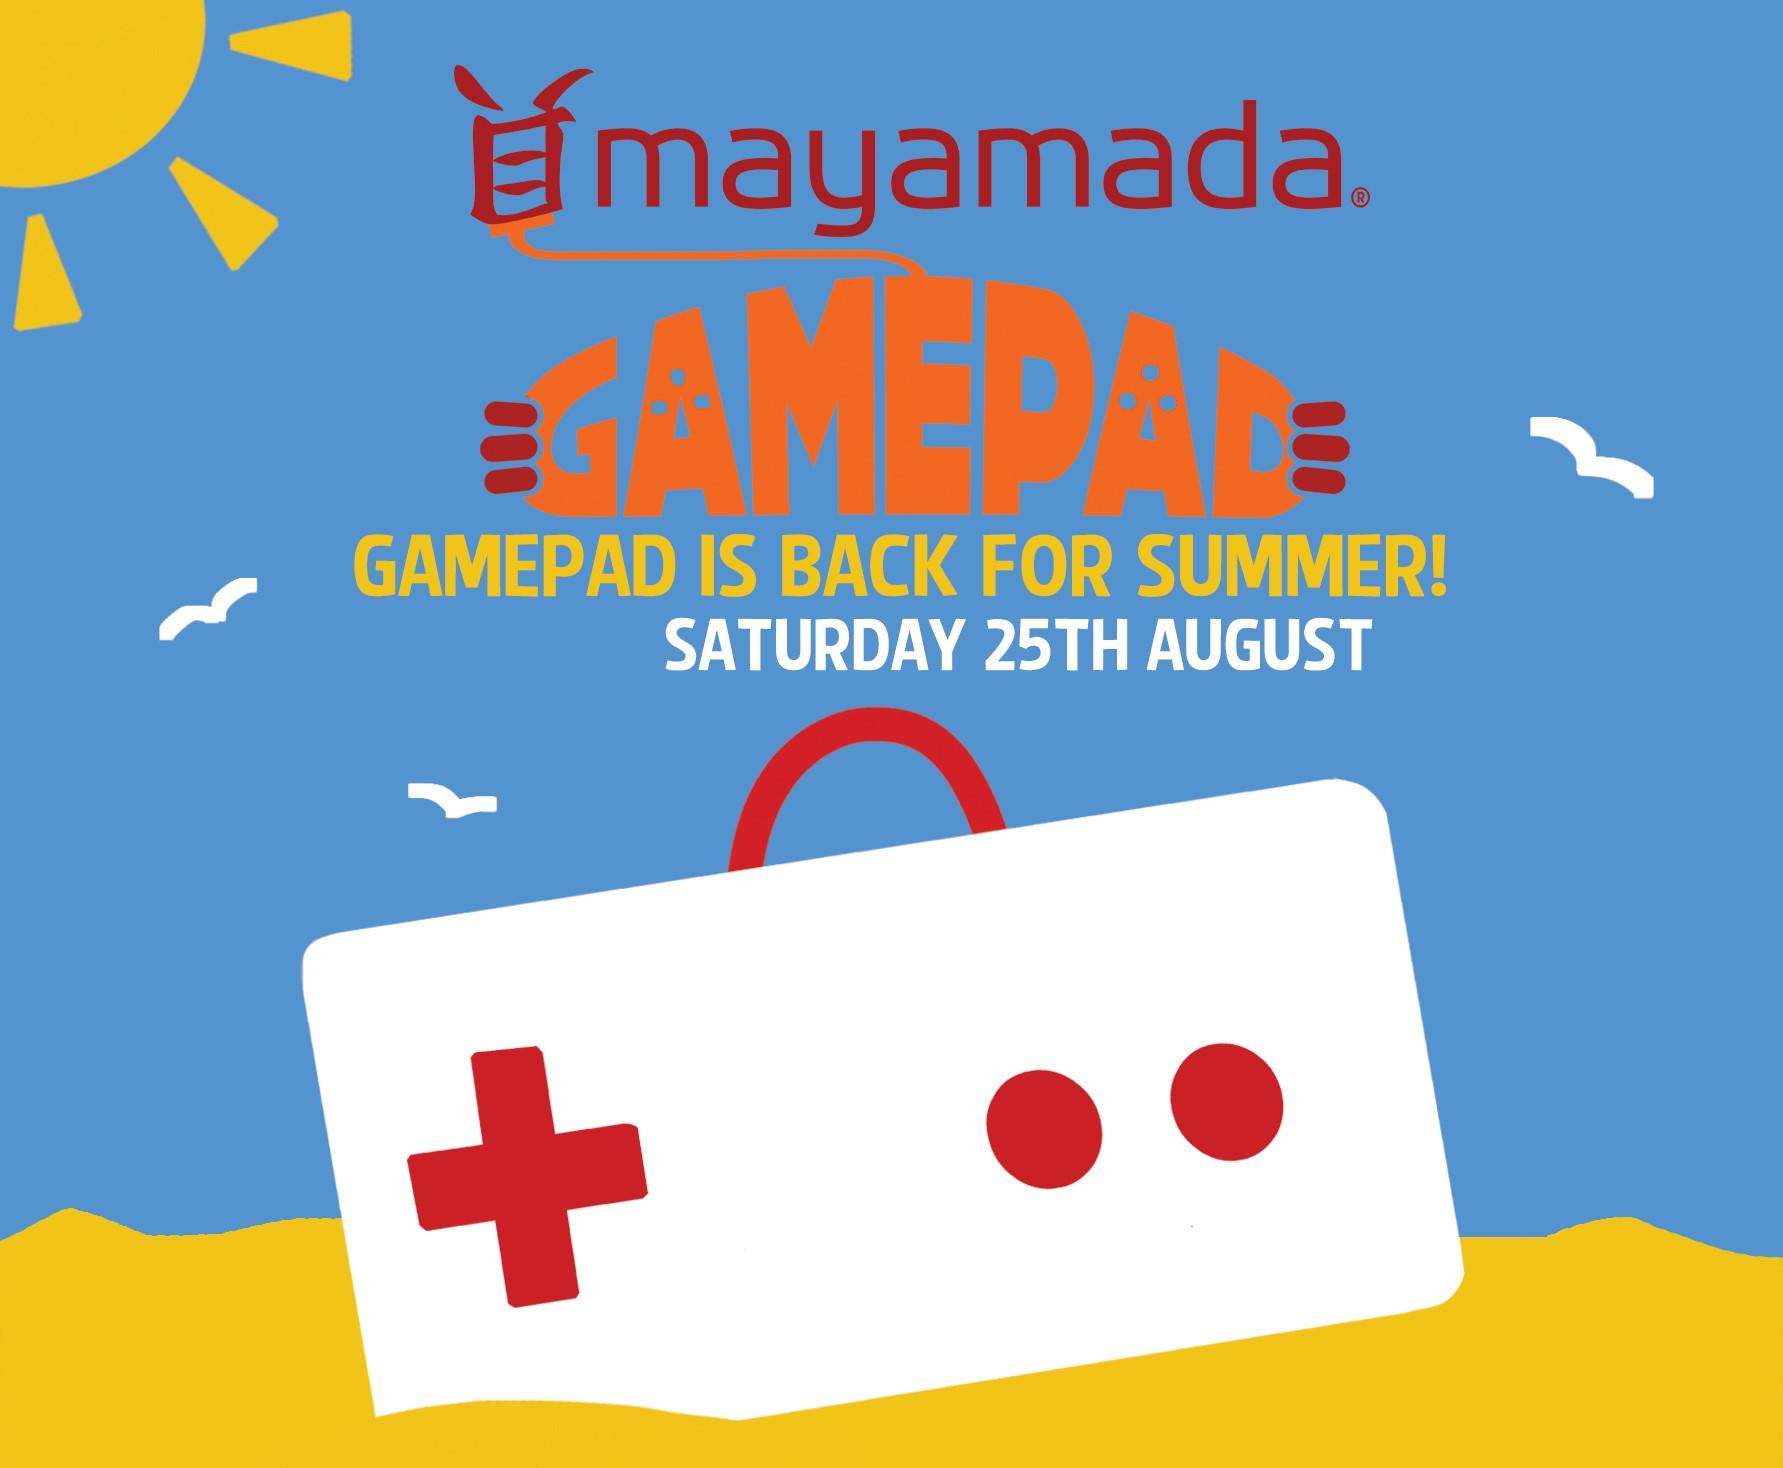 GamePad is Back!